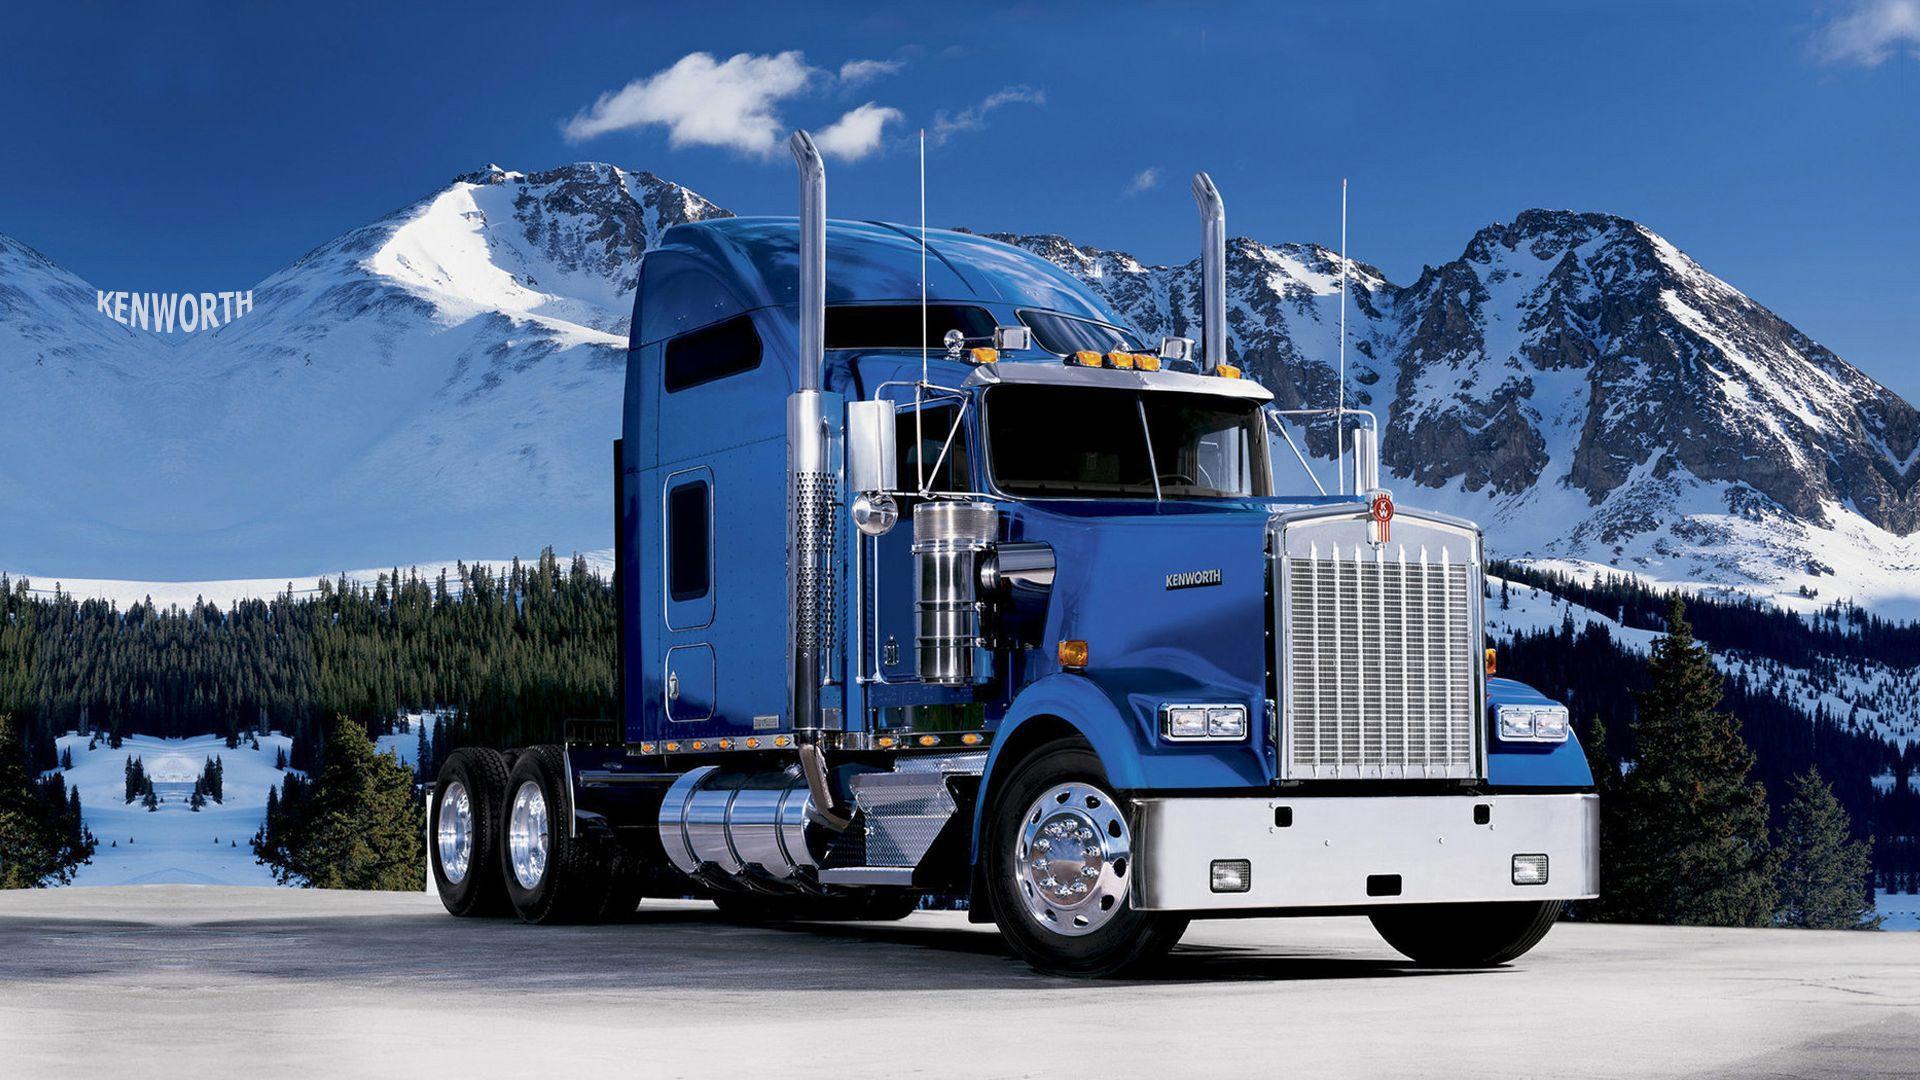 Blue Truck Wallpapers   Top Blue Truck Backgrounds 1920x1080